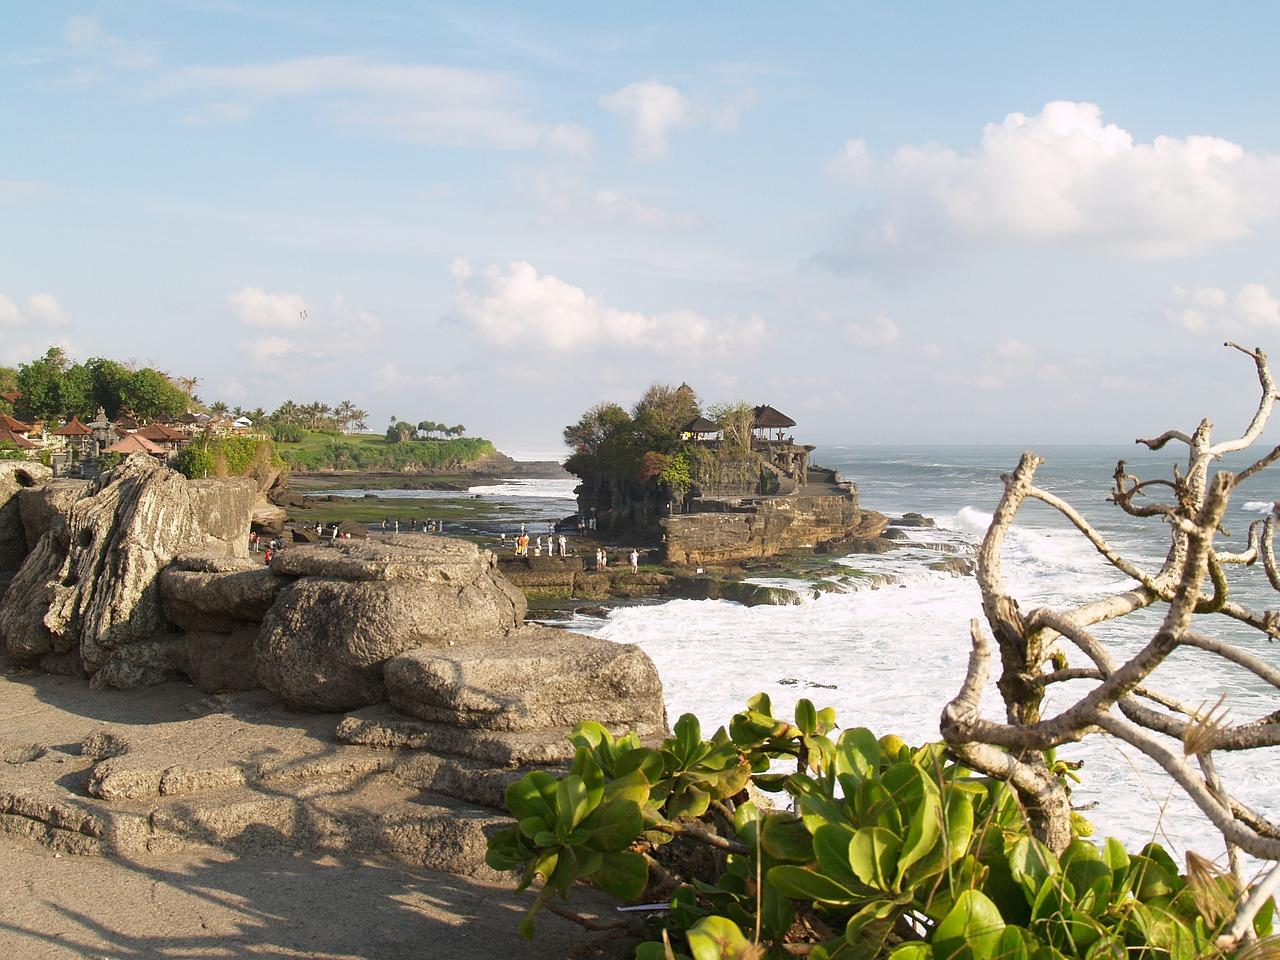 indonesia, asia, bali, pura tanah lot, азия, индонезия, бали, танах лот